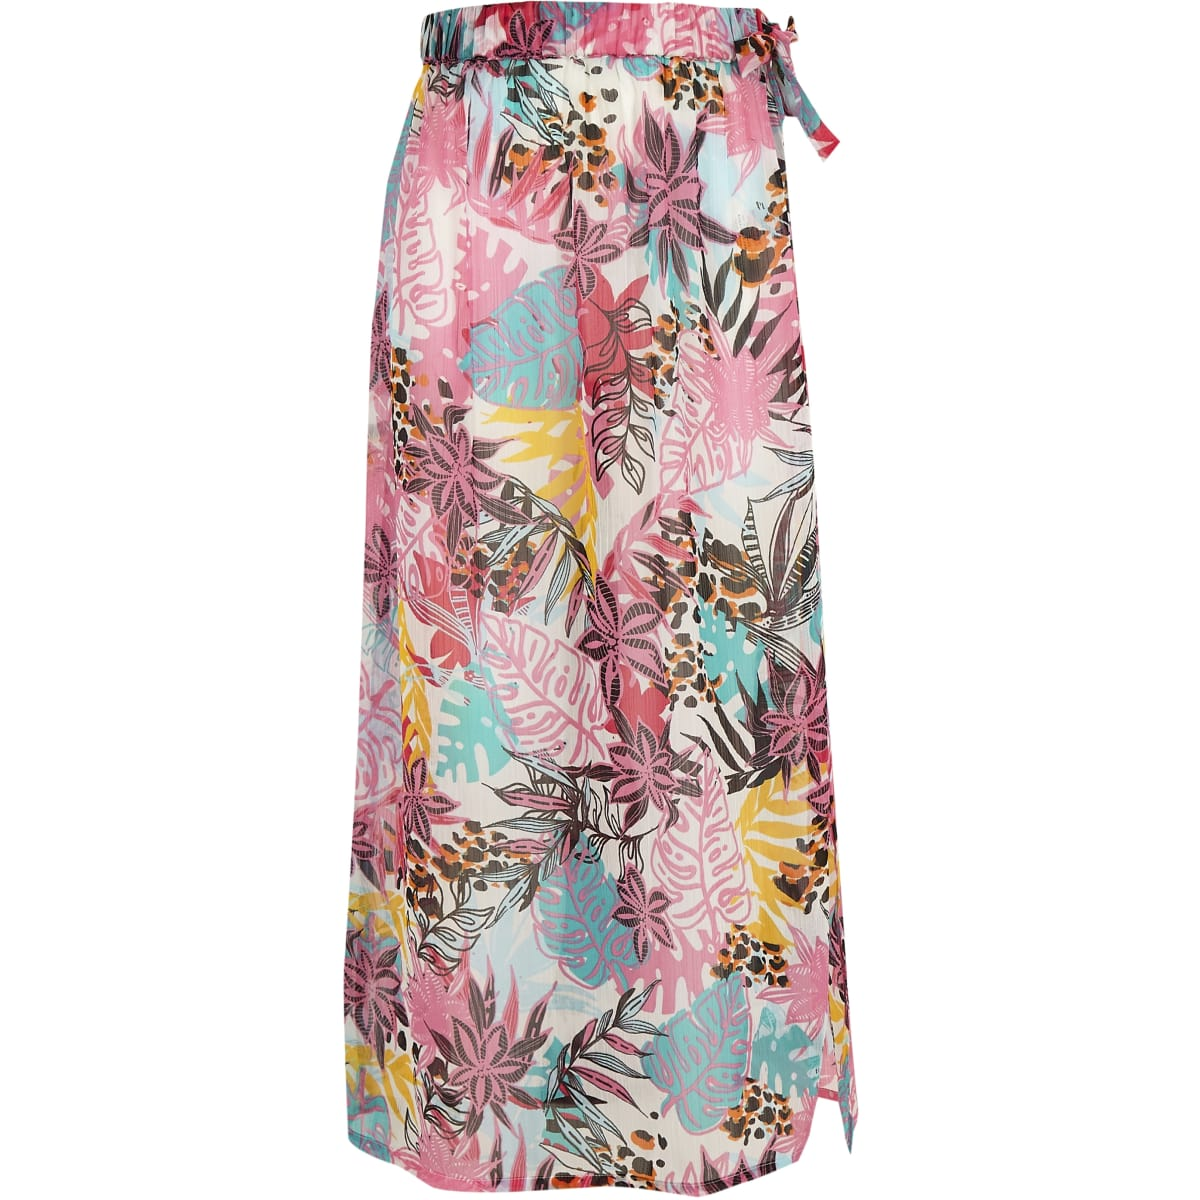 Girls white tropical beach skirt